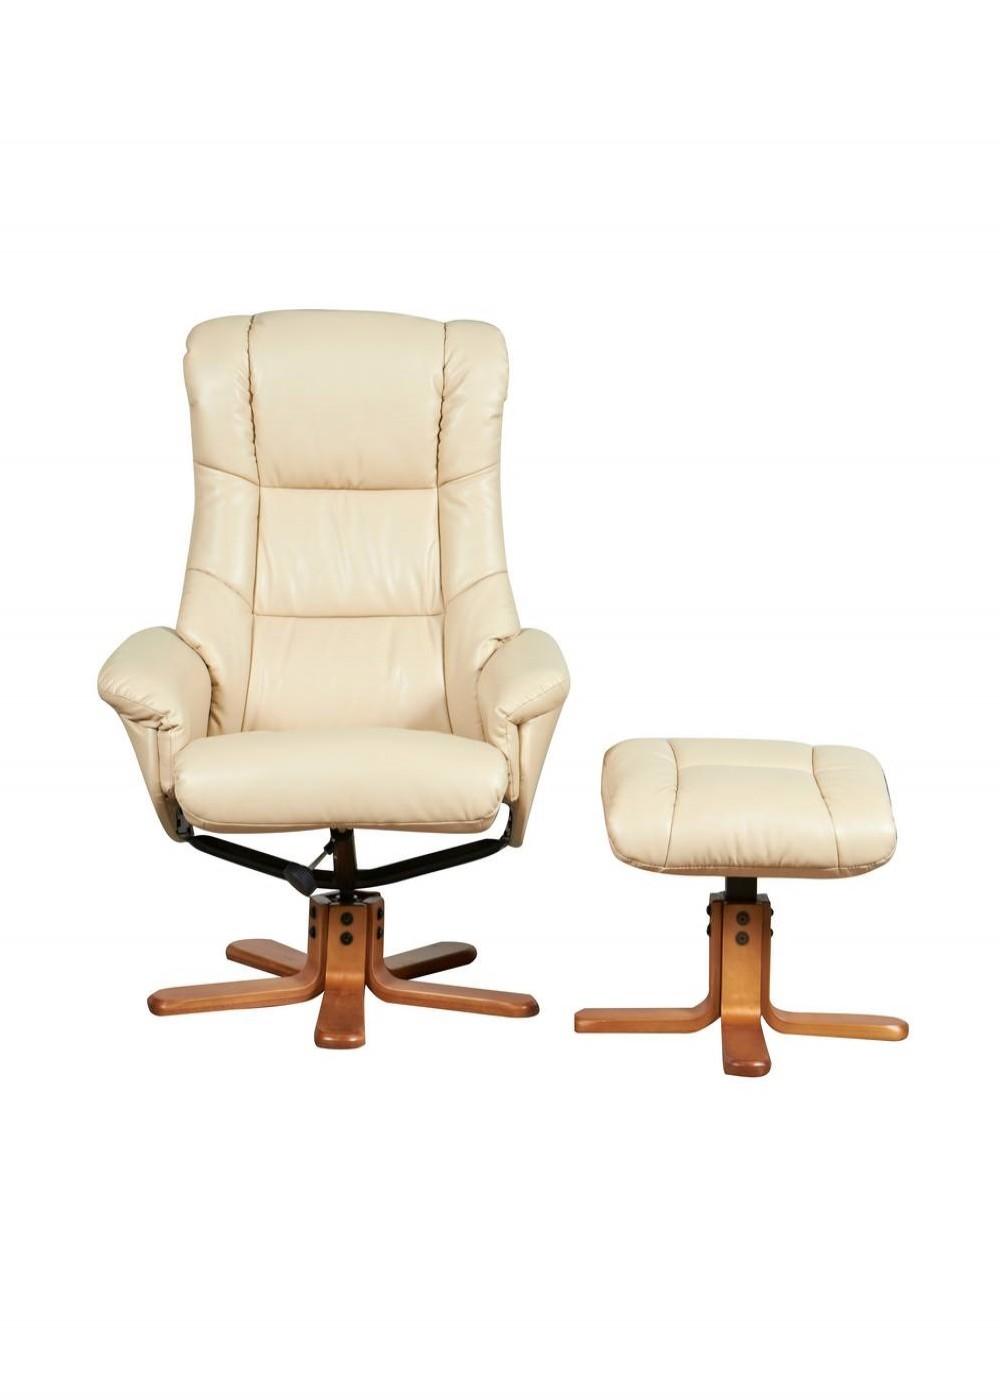 chicago luxury recliner 6922 cream 121 office furniture